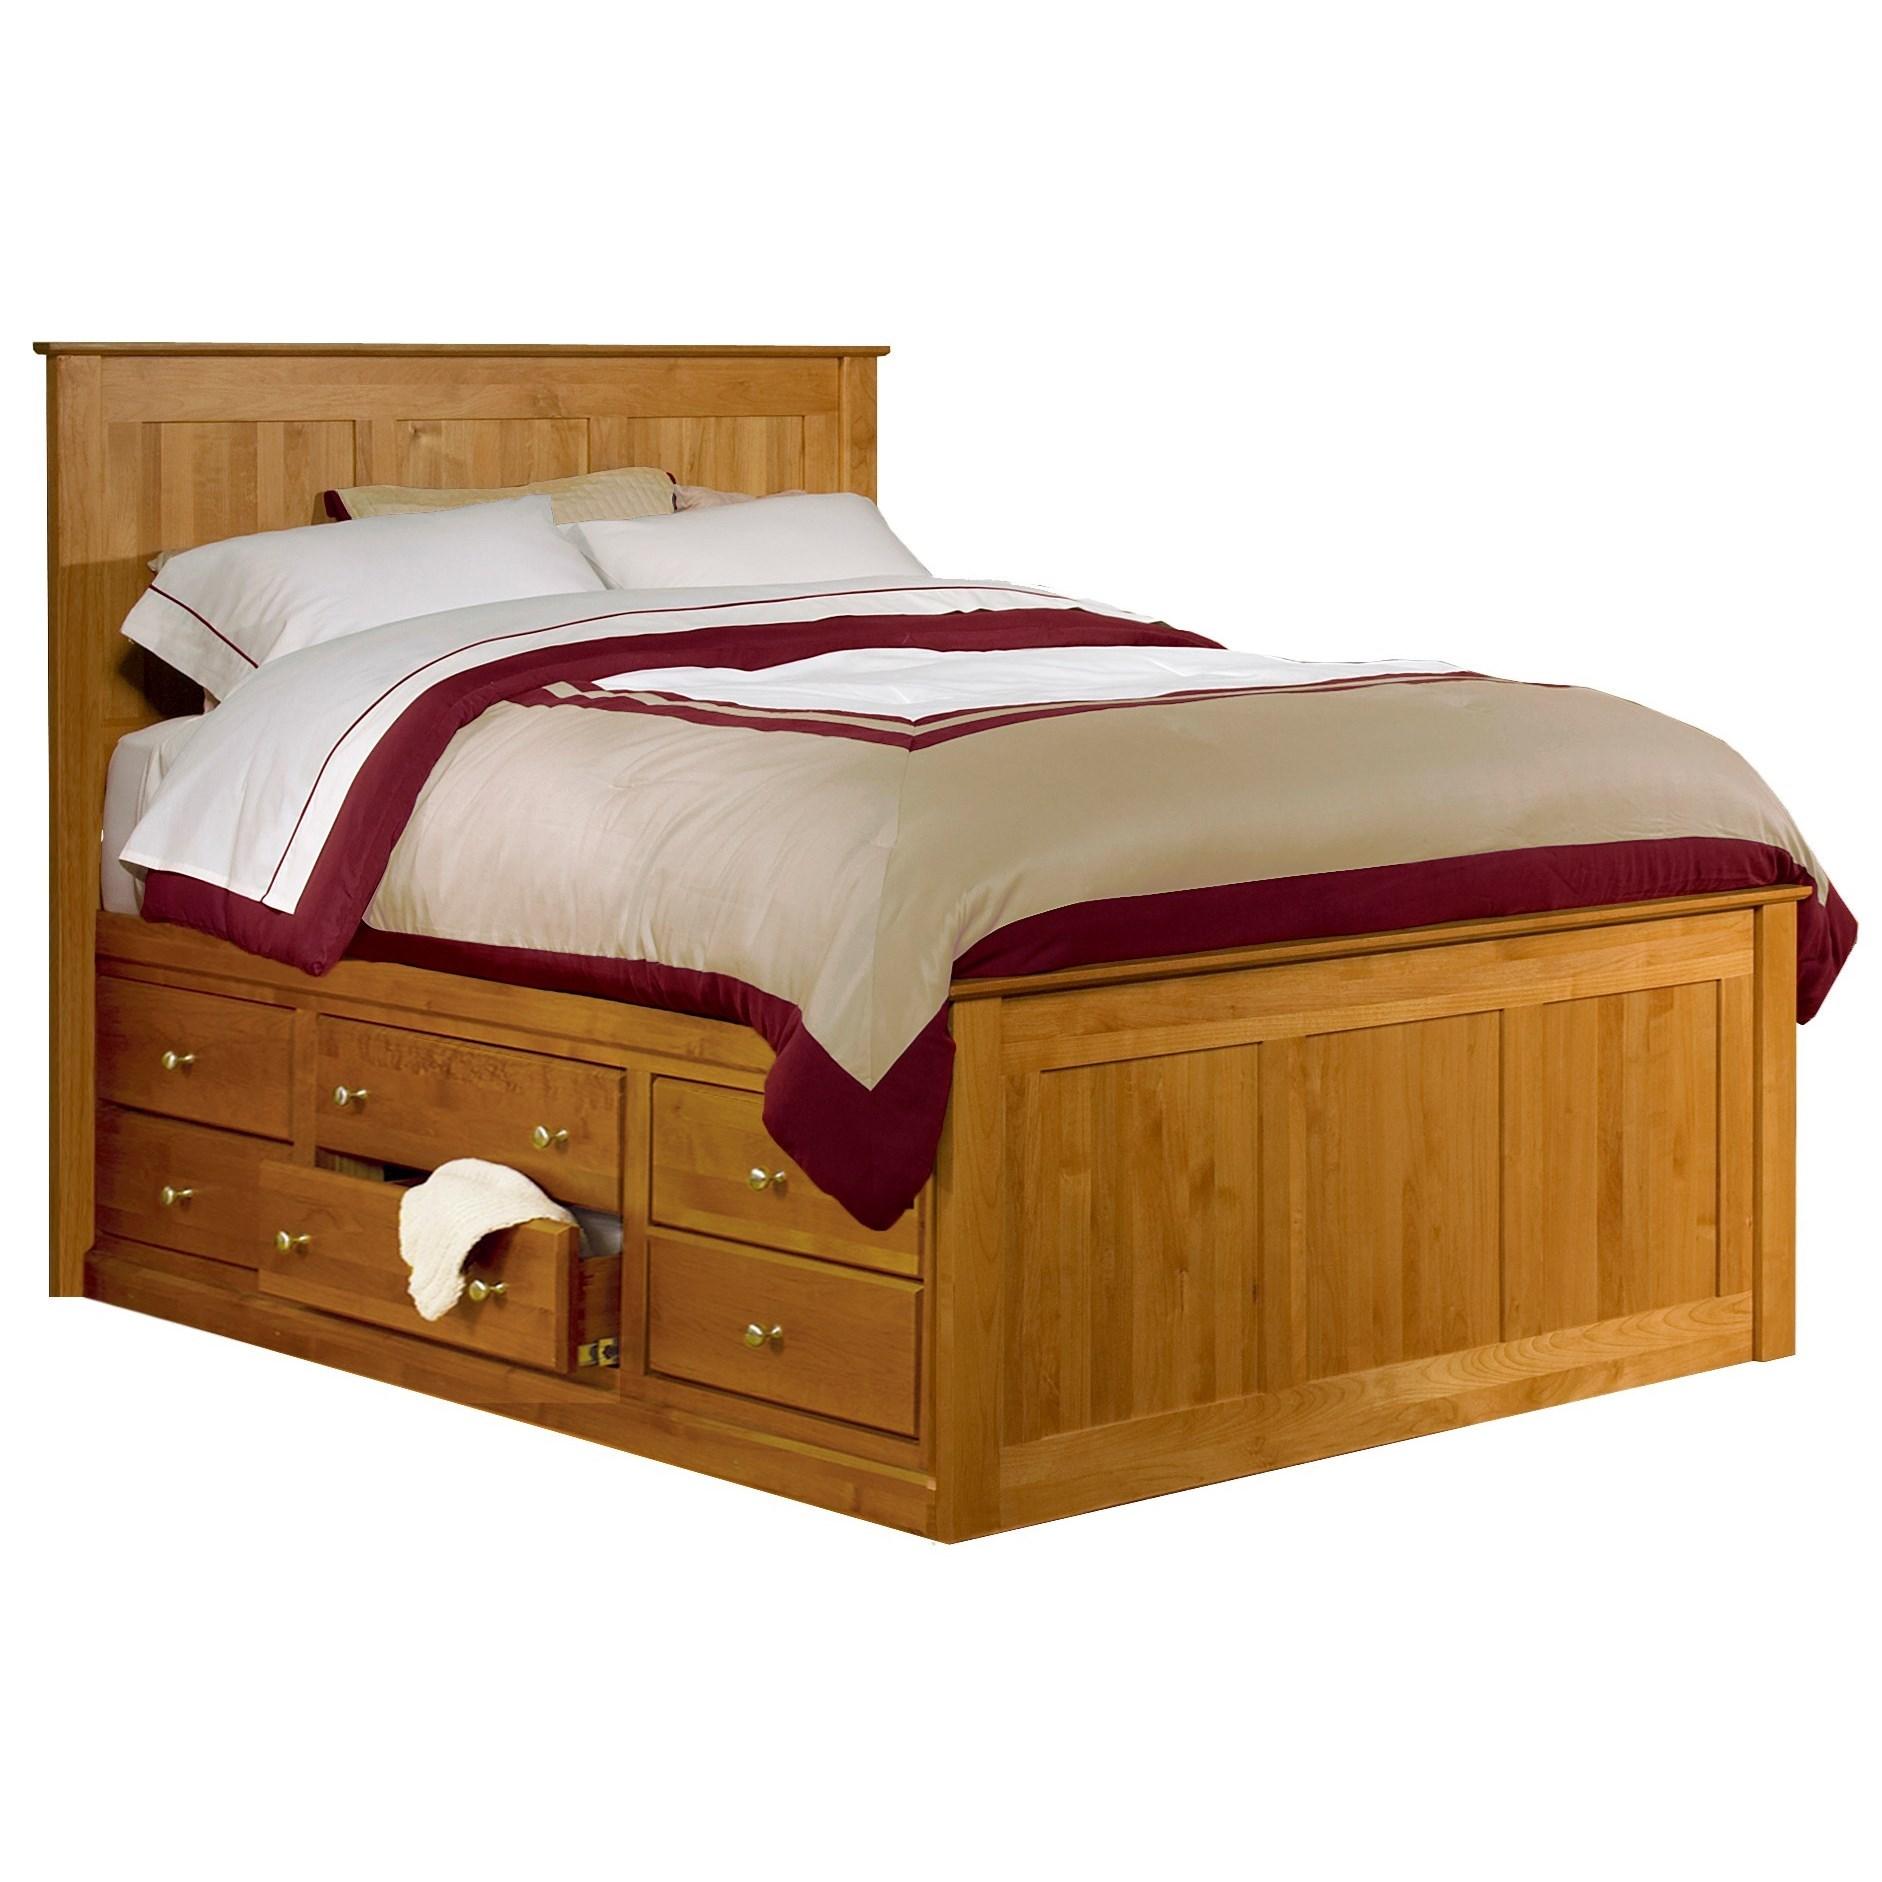 Alder Shaker Chest Bed Queen Alder Shaker Chest Bed by Archbold Furniture at Mueller Furniture